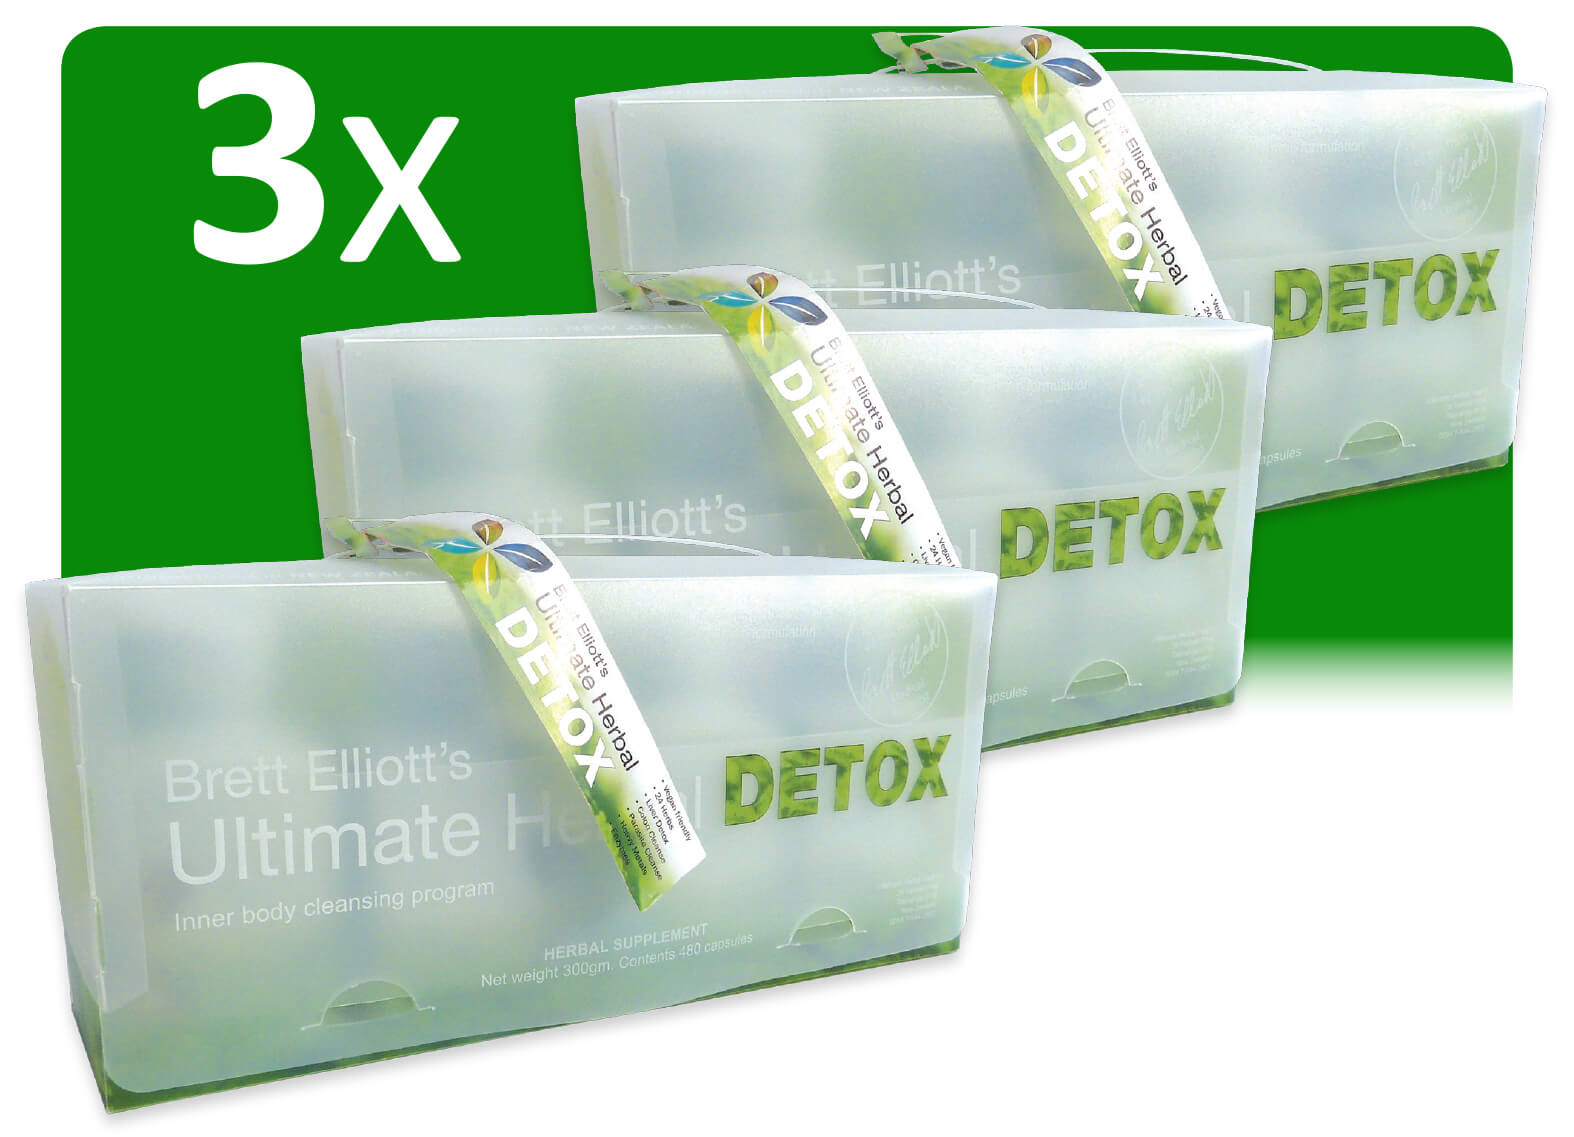 3 x Ultimate Herbal Detox programs